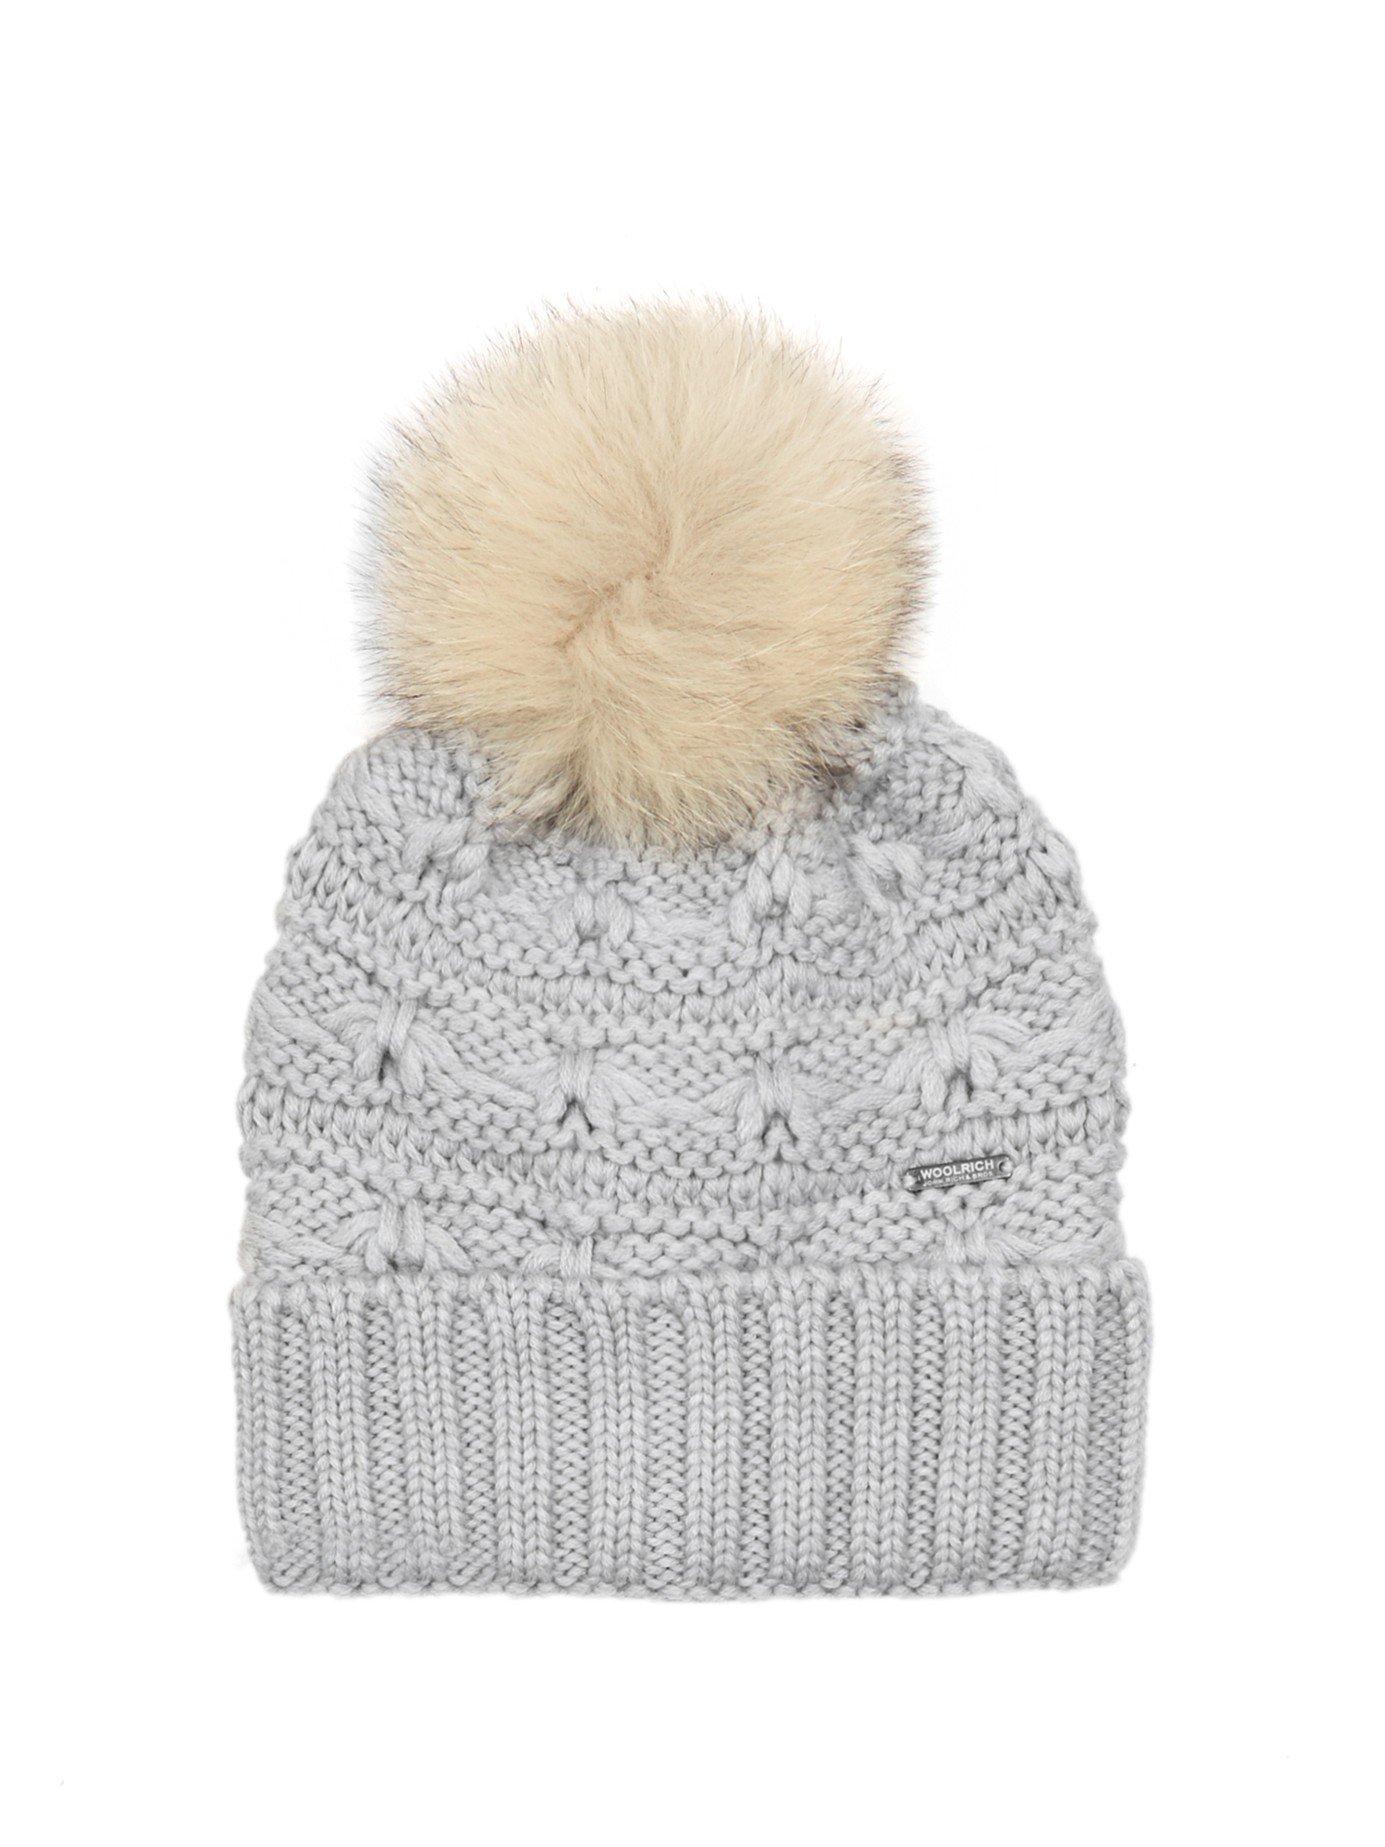 Lyst - Woolrich Serenity Fur-pompom Wool Beanie Hat in Gray 31ccb340e7d6